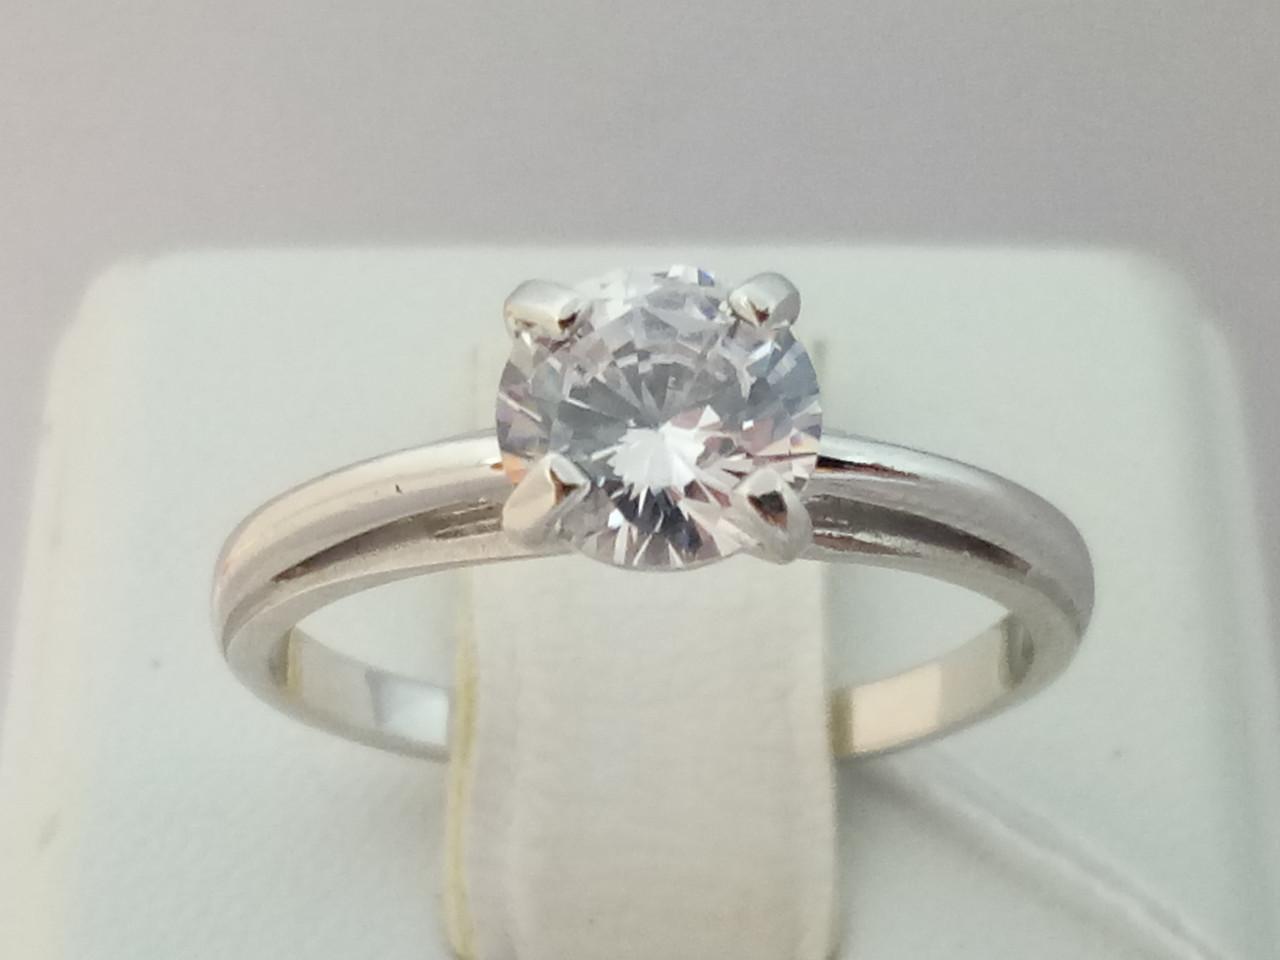 Серебряное кольцо с фианитом. Артикул 14163-Р 16,5